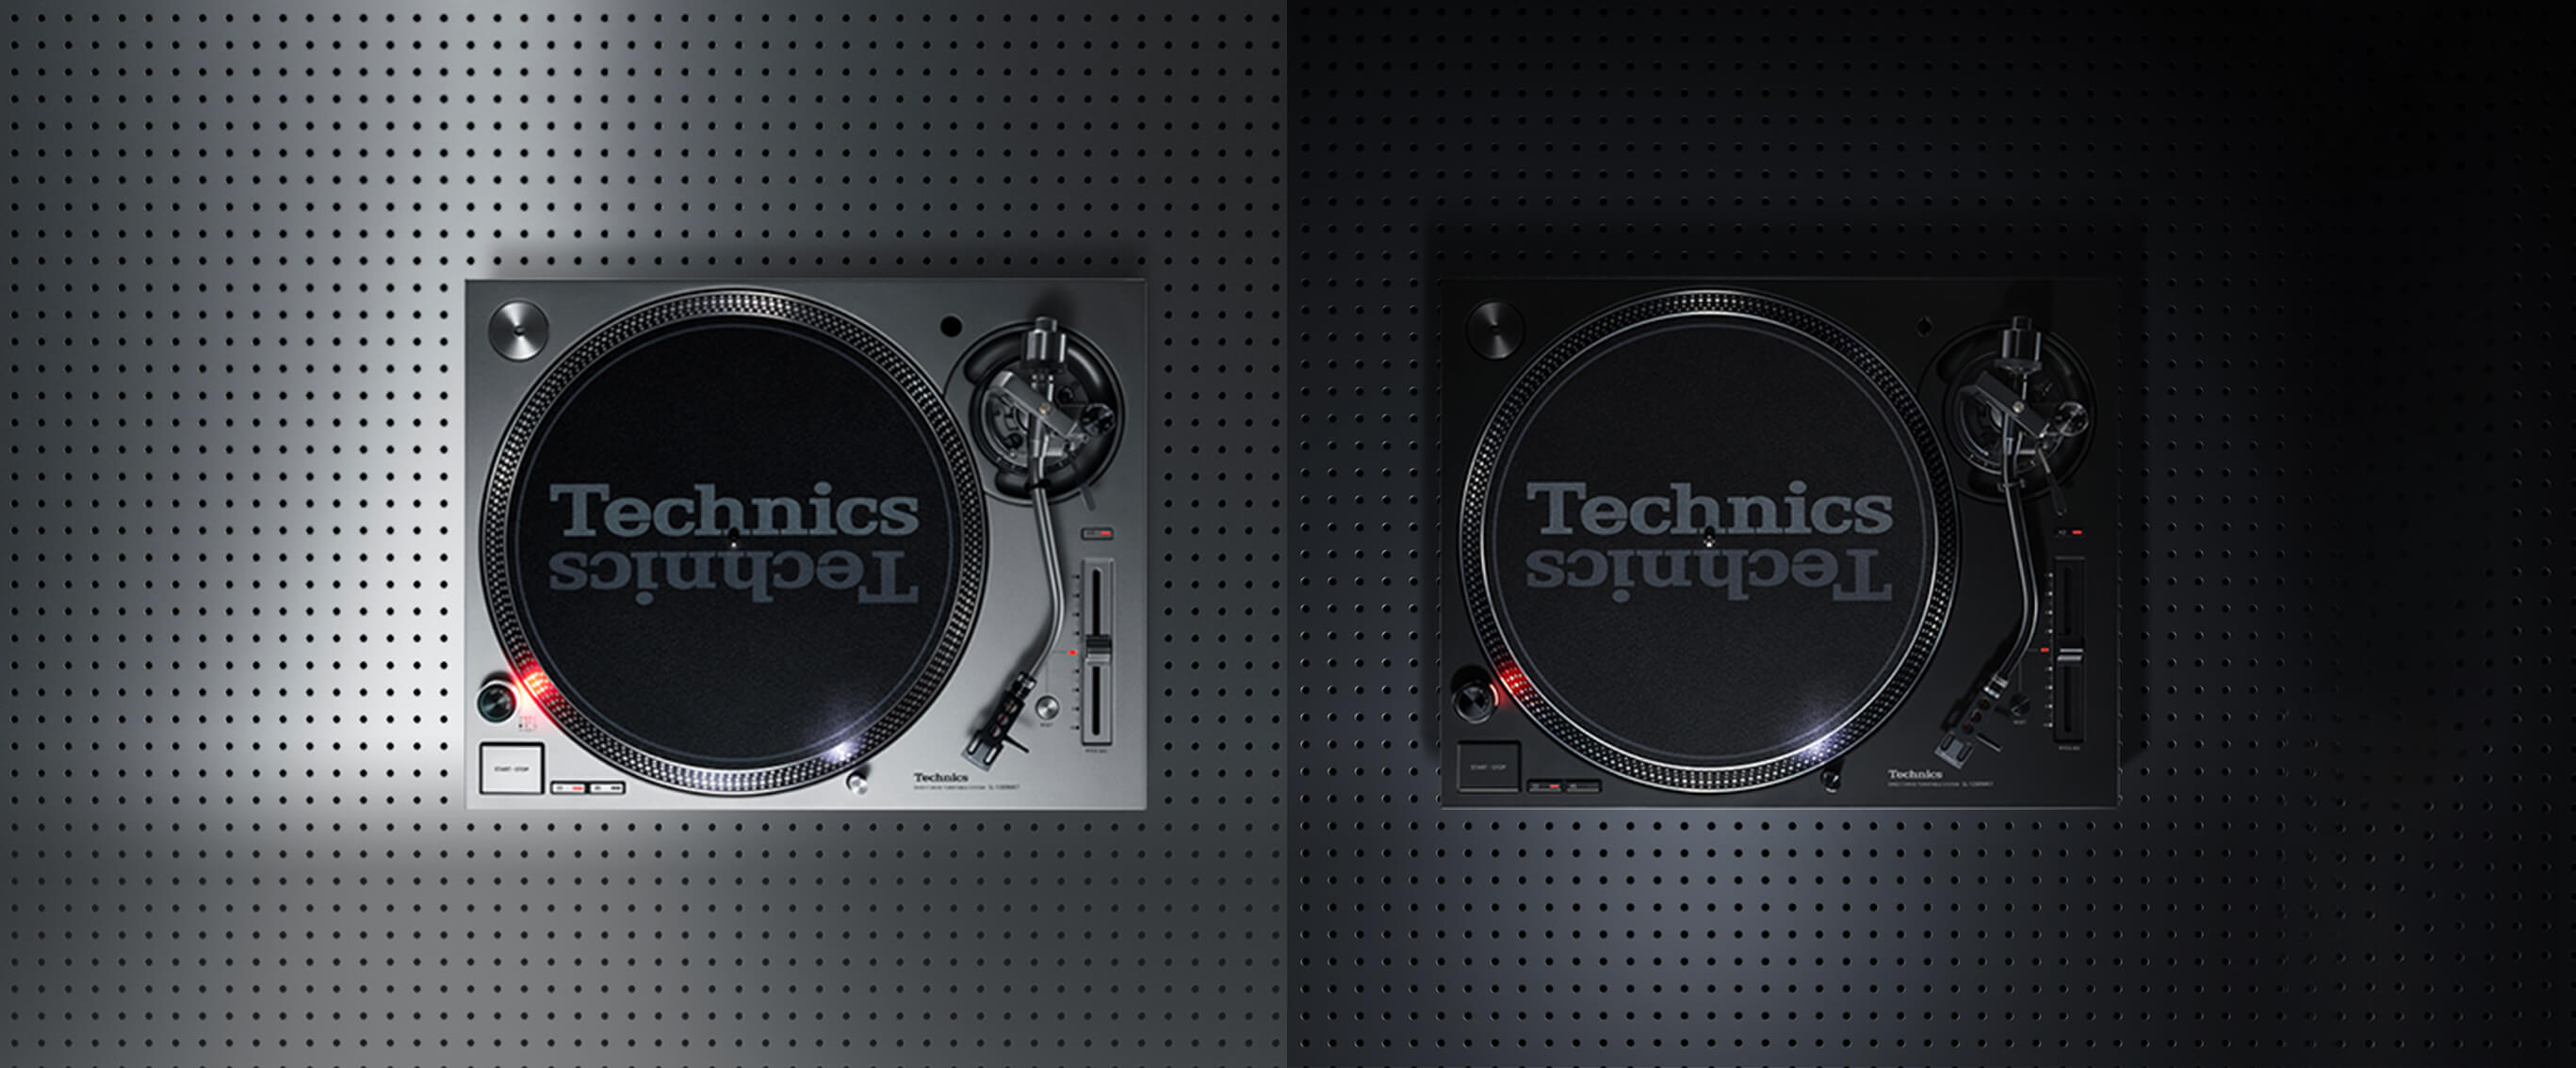 Panasonic Technics『SL-1200MK7』